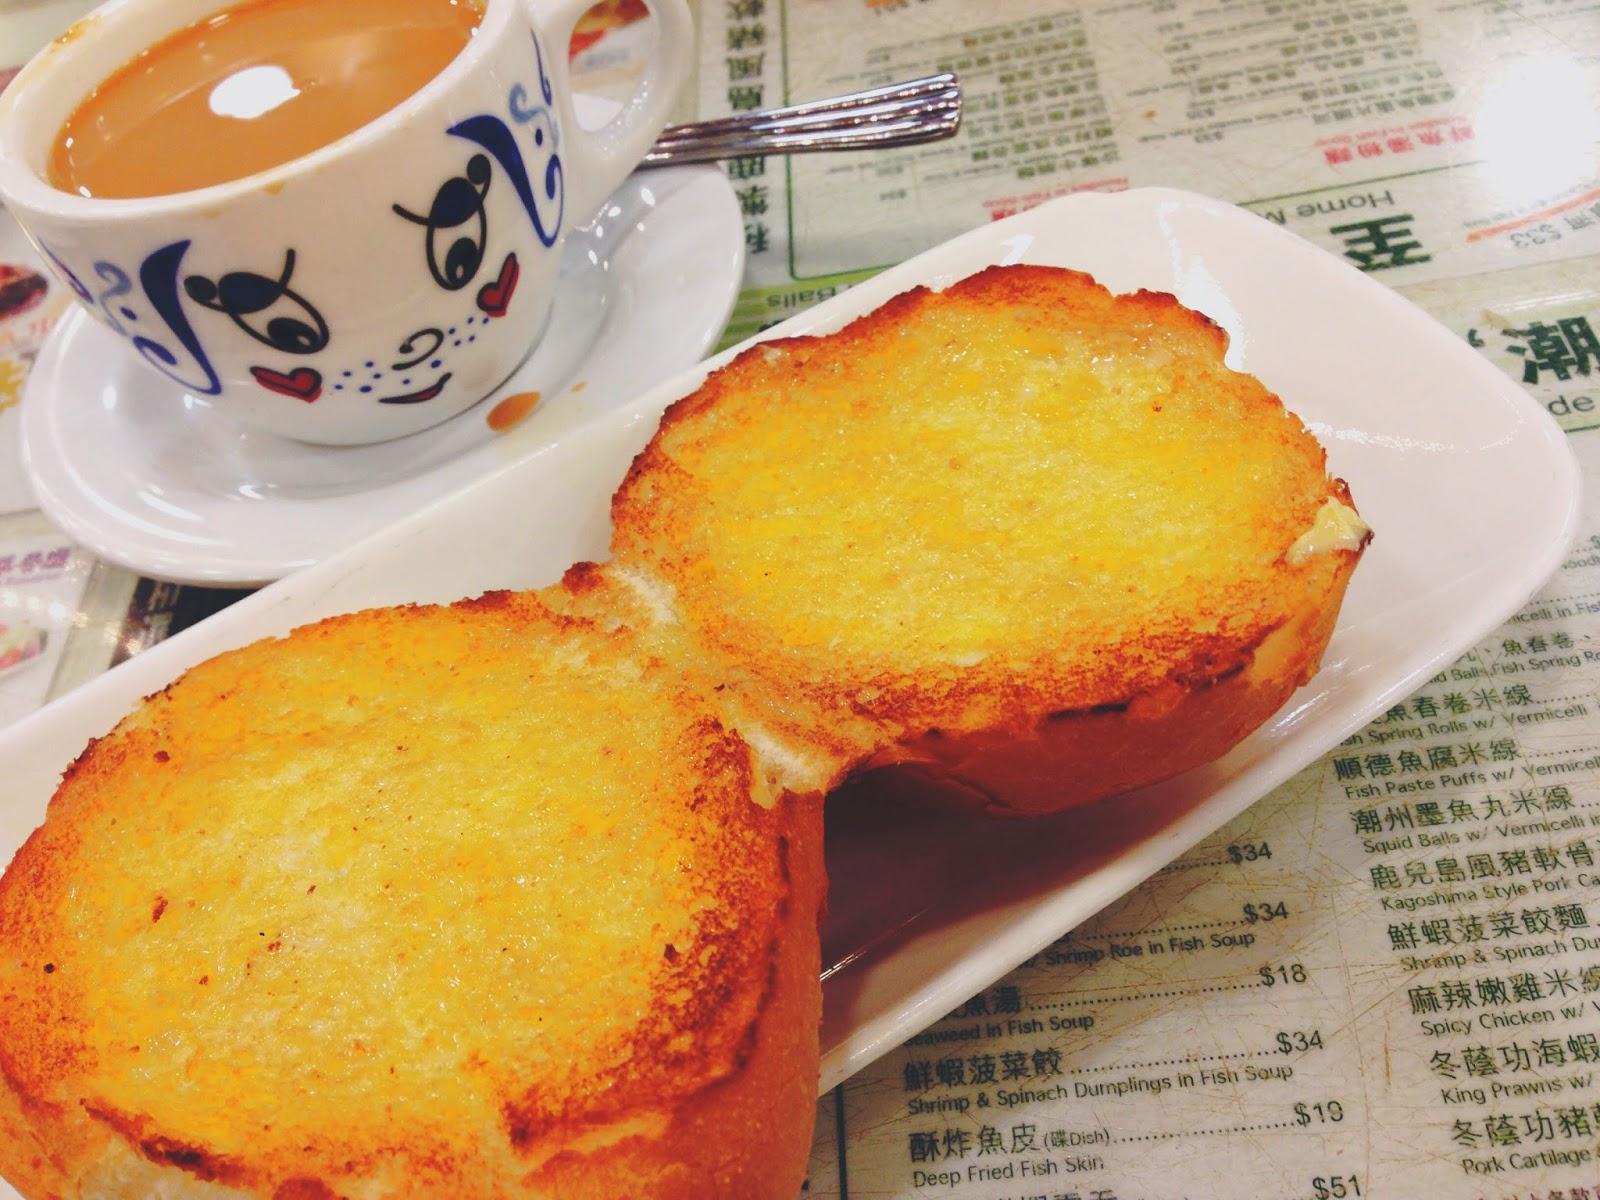 Tsui Wah Hong Kong crispy bun with condensed milk